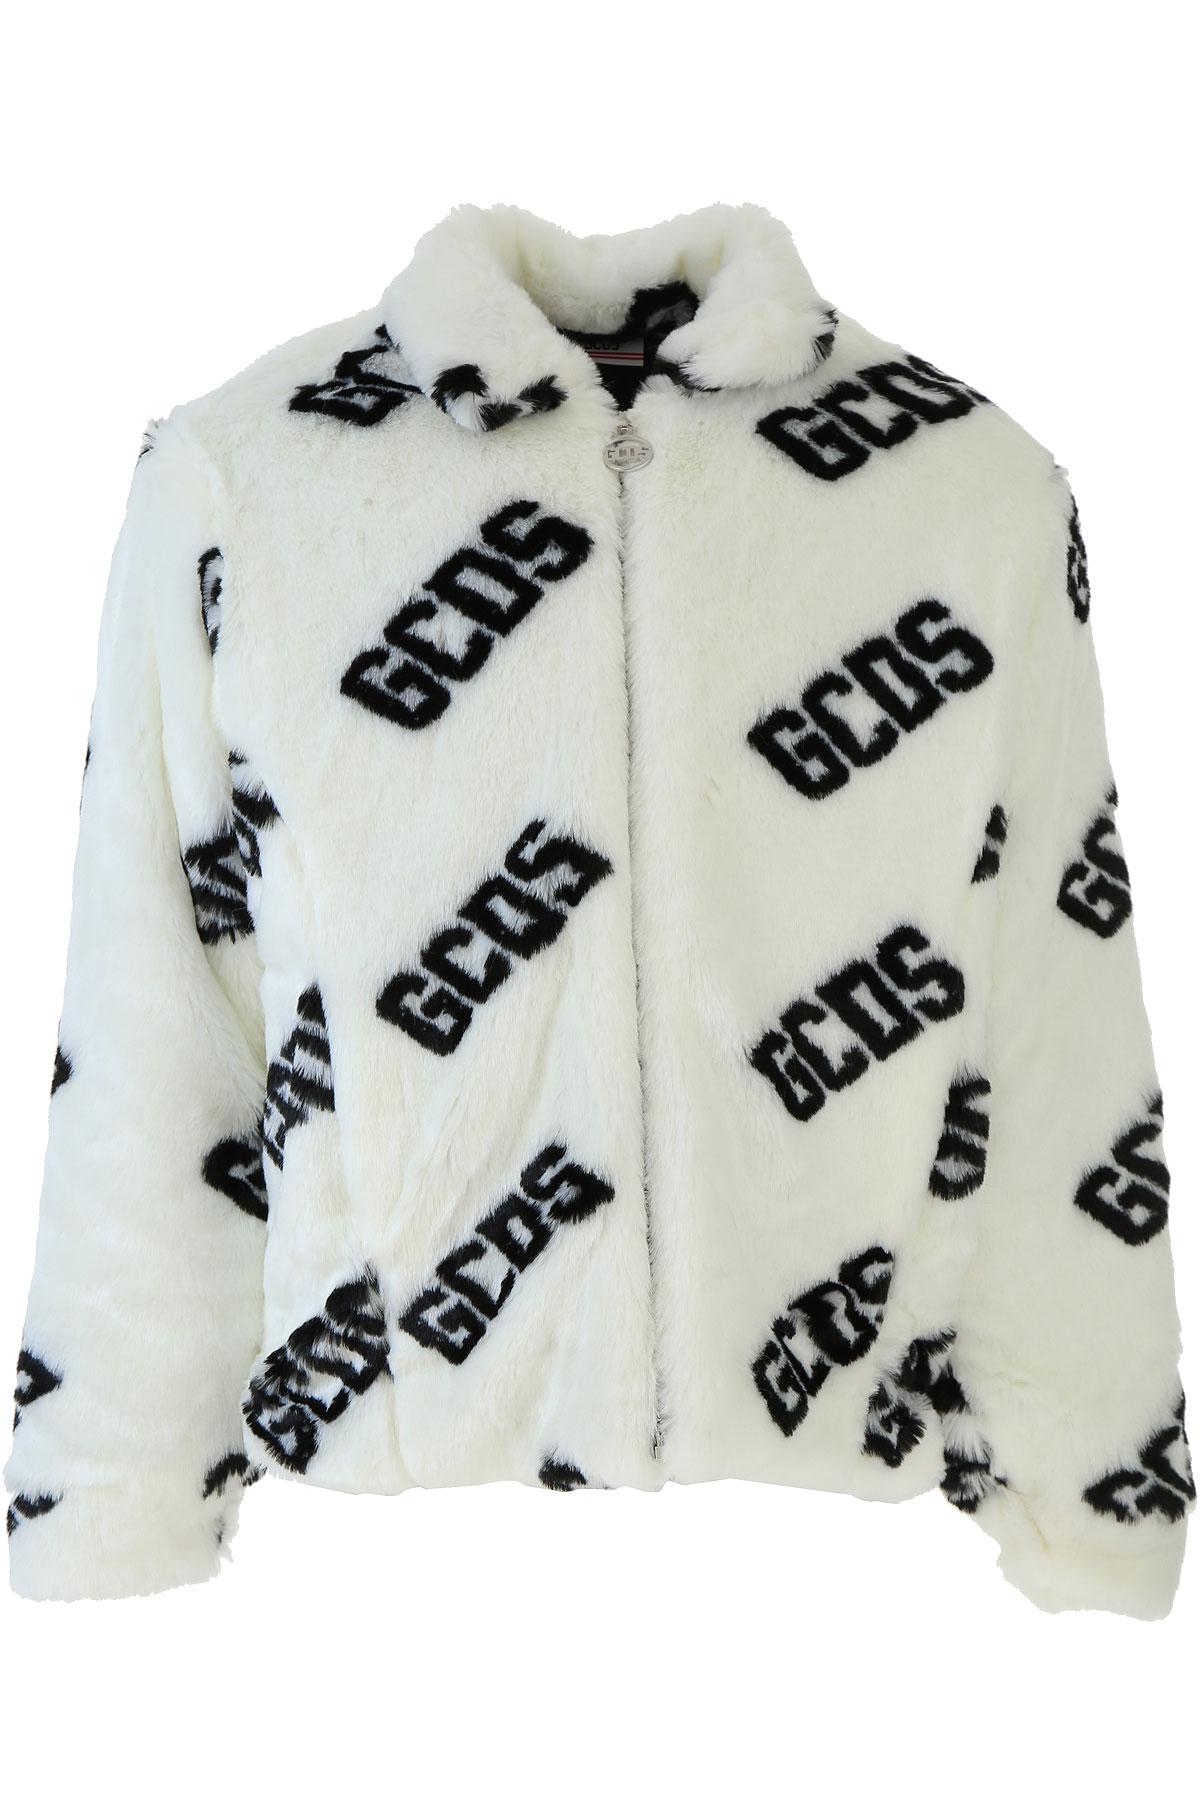 Image of GCDS Jacket for Men, White, acetate, 2017, L M S XL XS